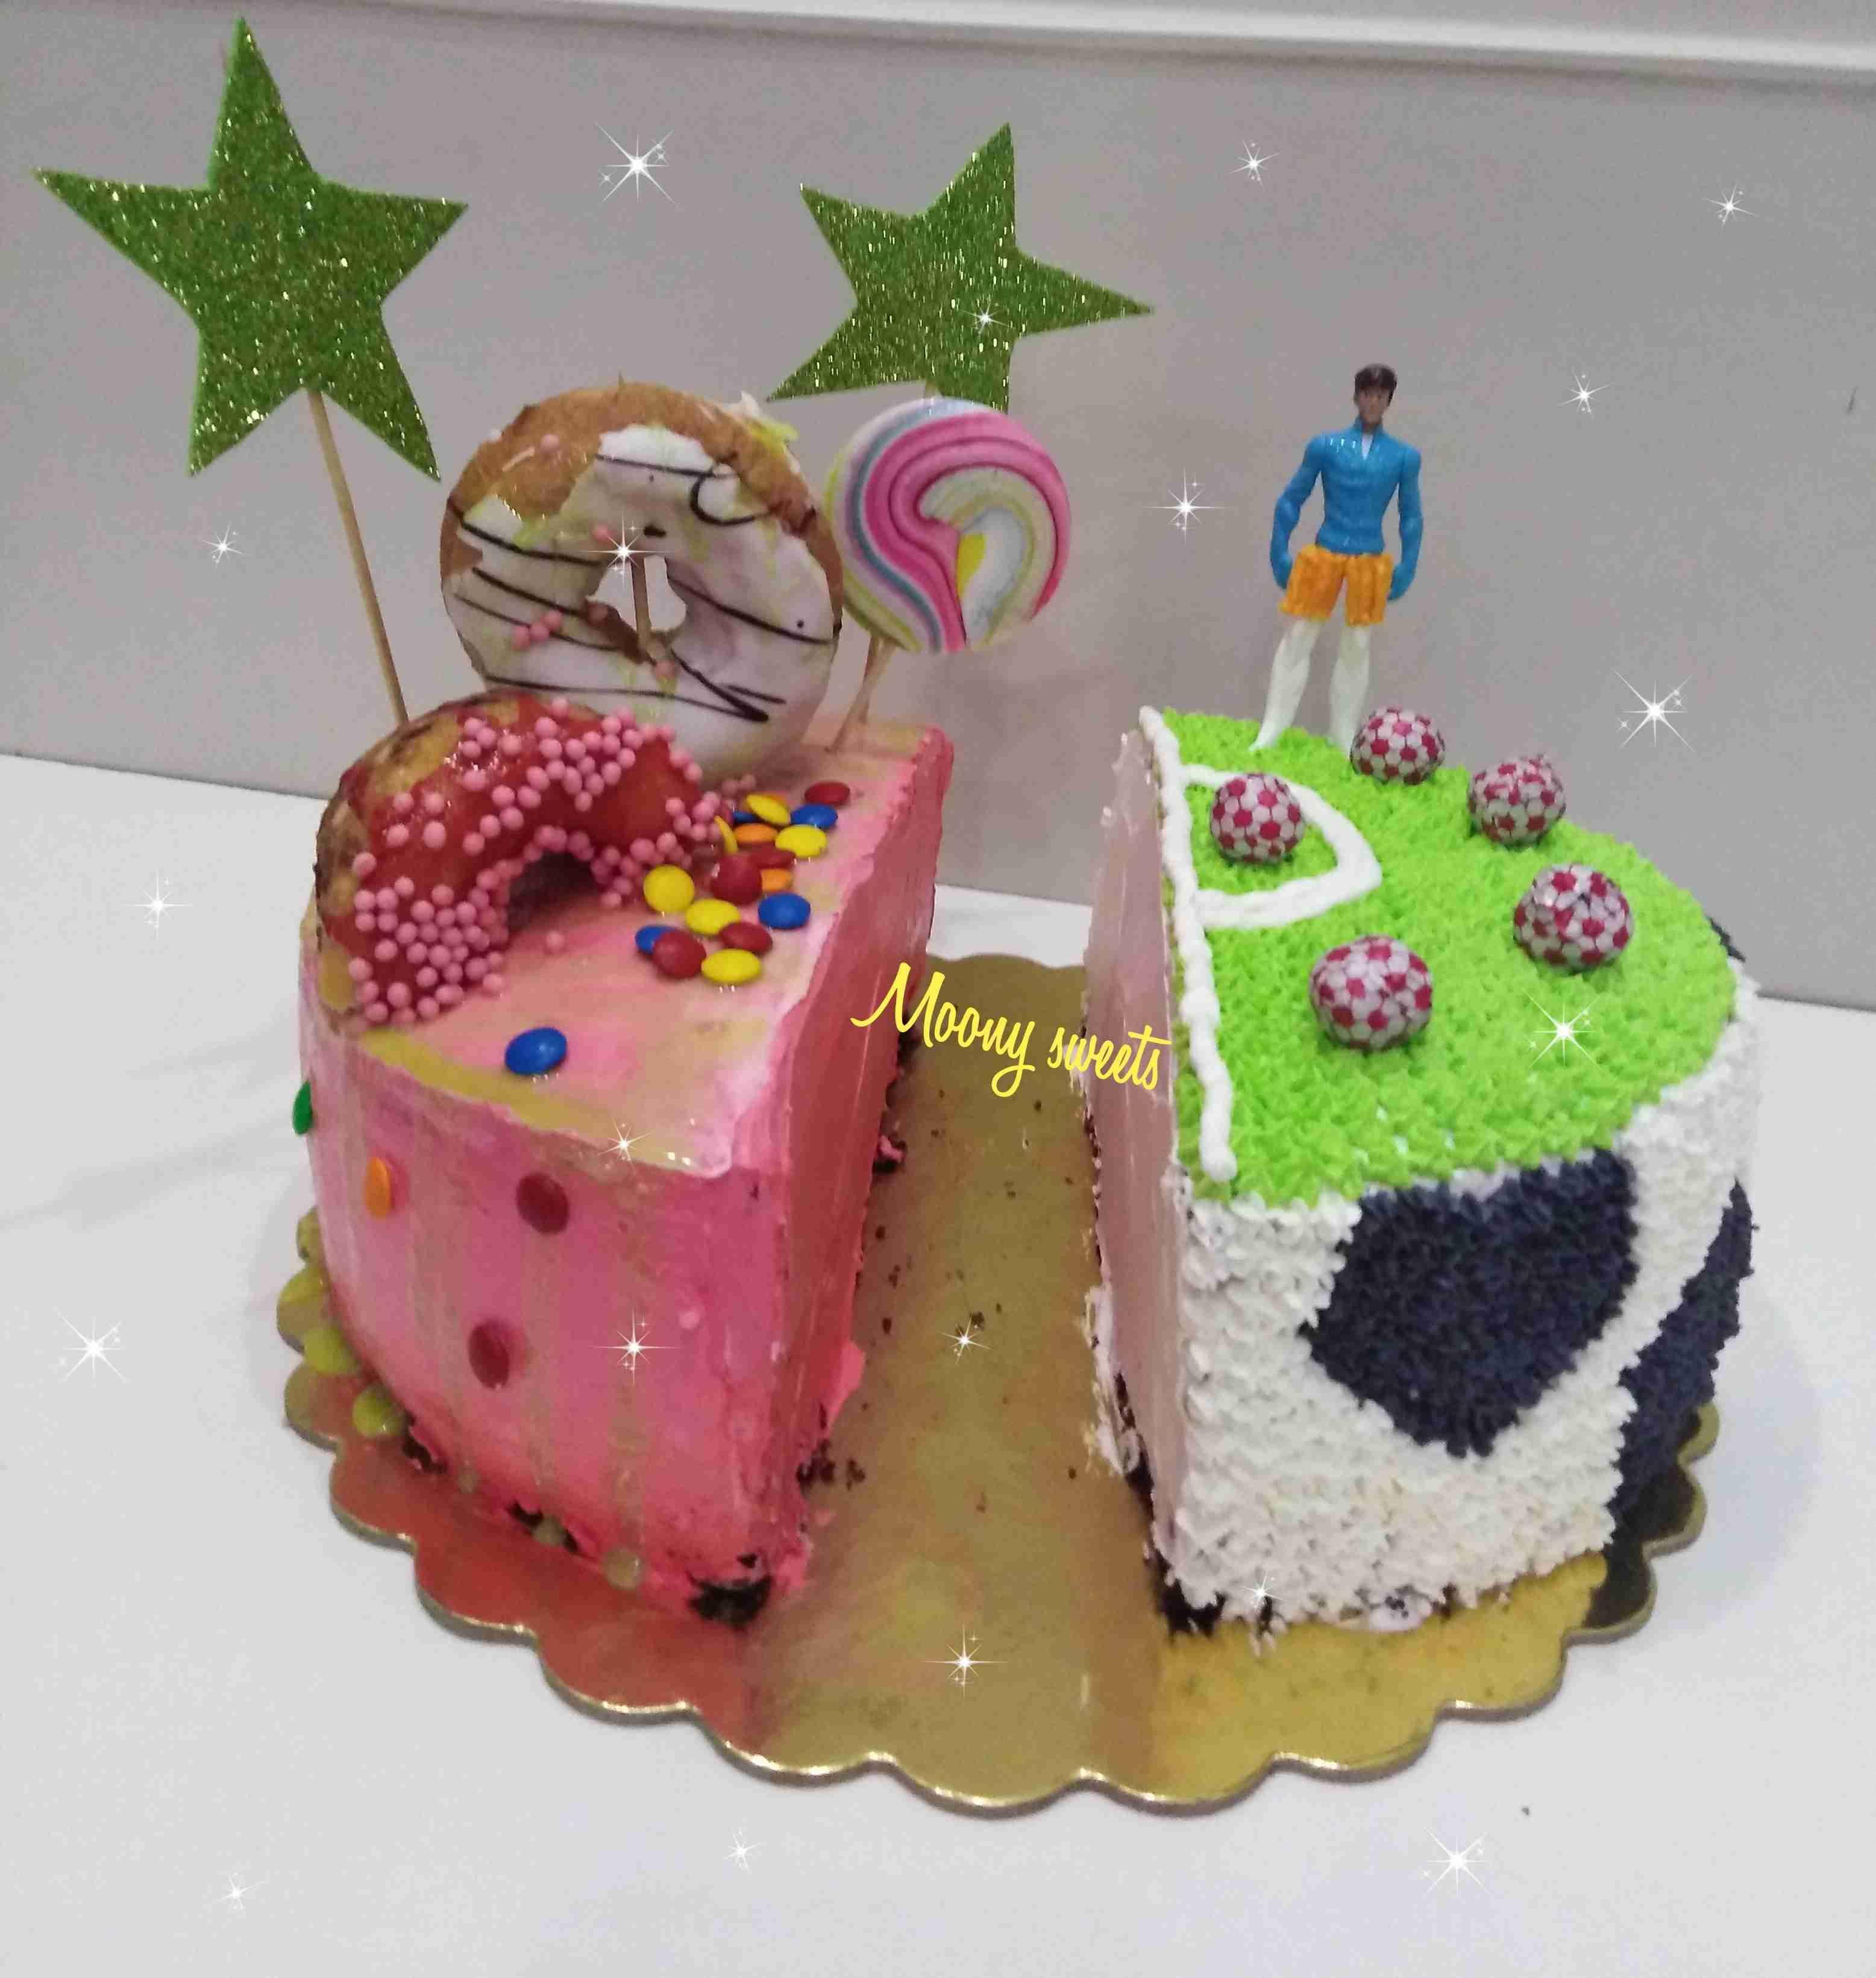 كيكة جمعت عيد ميلاد ولد وبنت زاكي Recipe Desserts Cake Birthday Cake